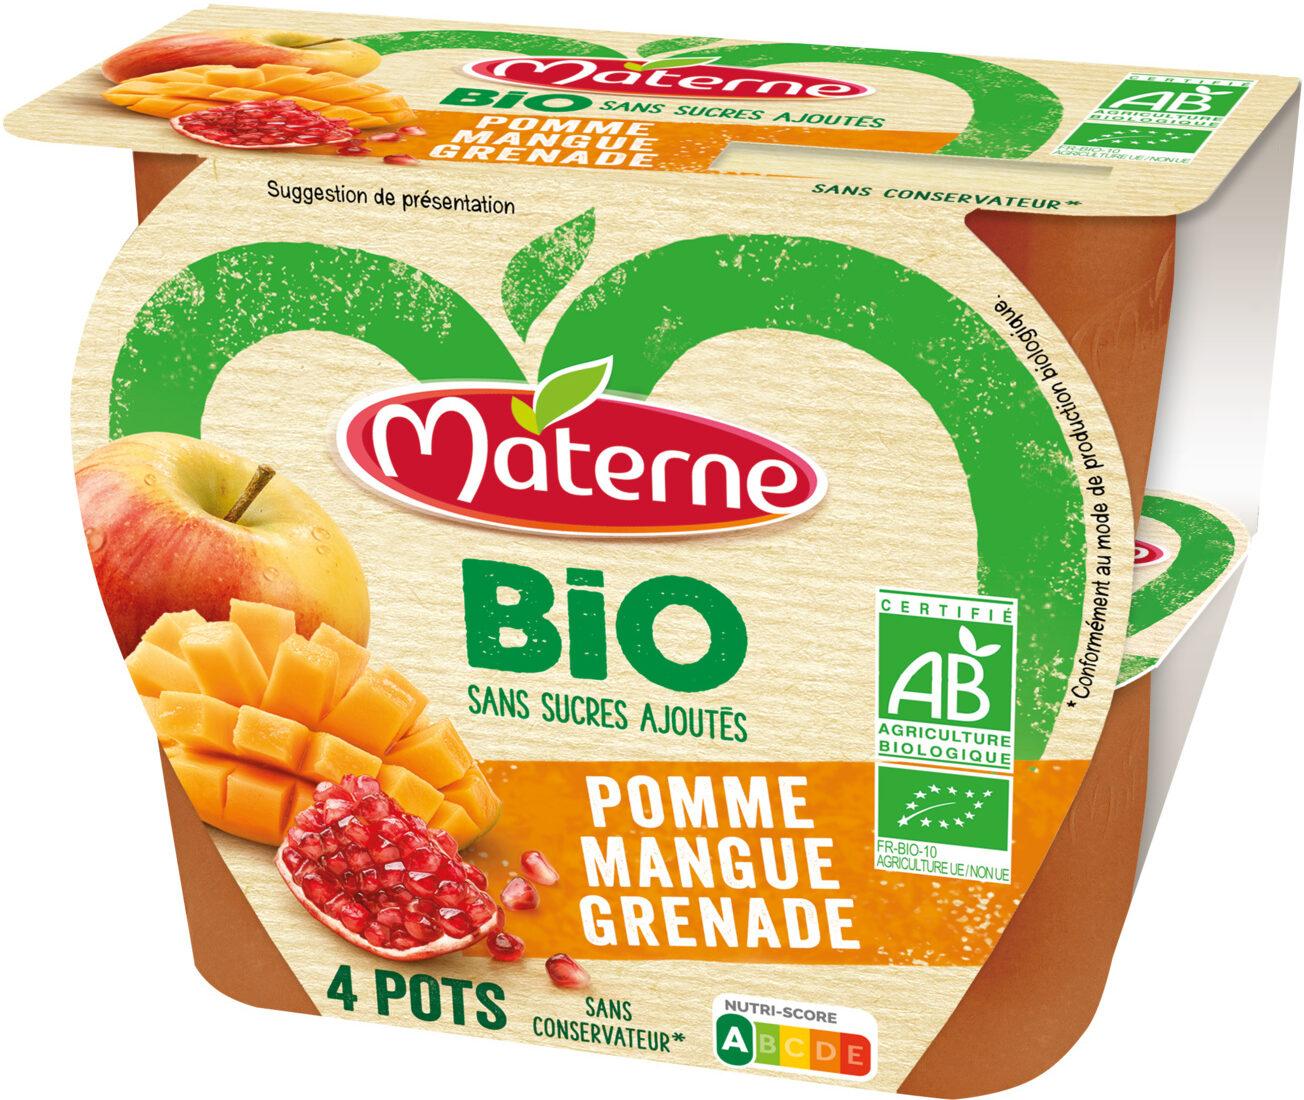 MATERNE BIO SSA Pomme Mangue Grenade 4x100g - Produit - fr